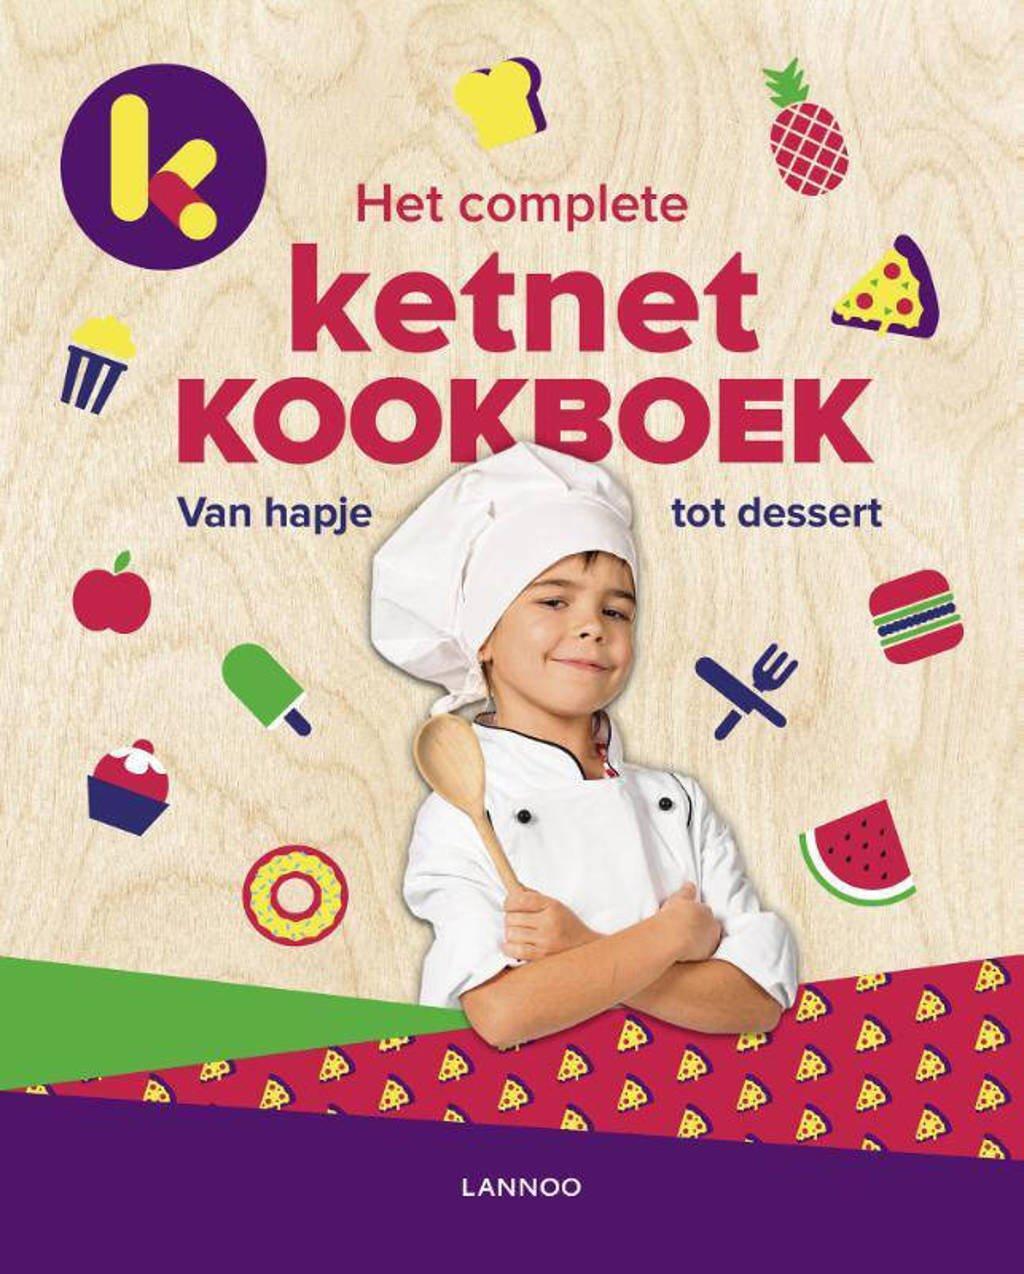 Ketnet: Het complete Ketnet kookboek - Sabrina Crijns en Hilde Smeesters